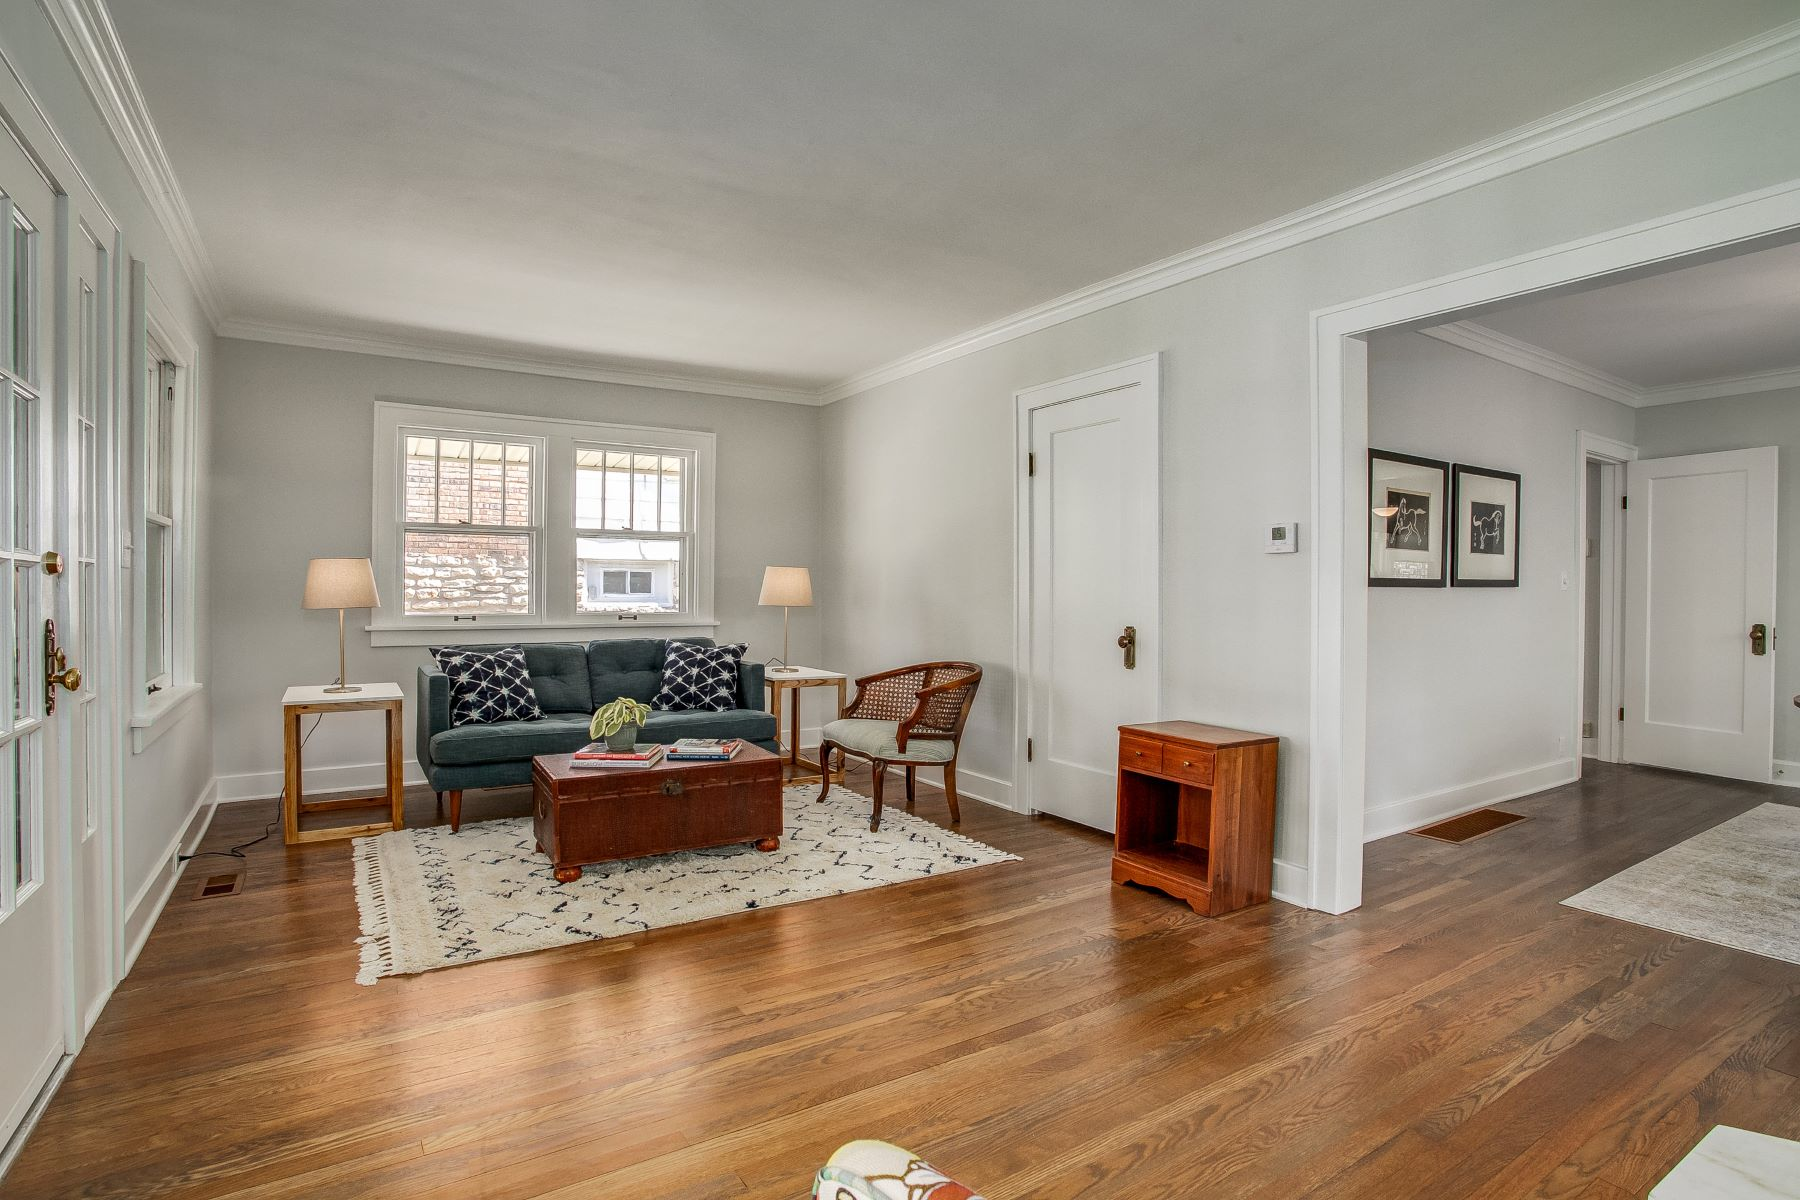 Single Family Homes for Active at Rockhurst Park 5121 Virginia Avenue Kansas City, Missouri 64110 United States